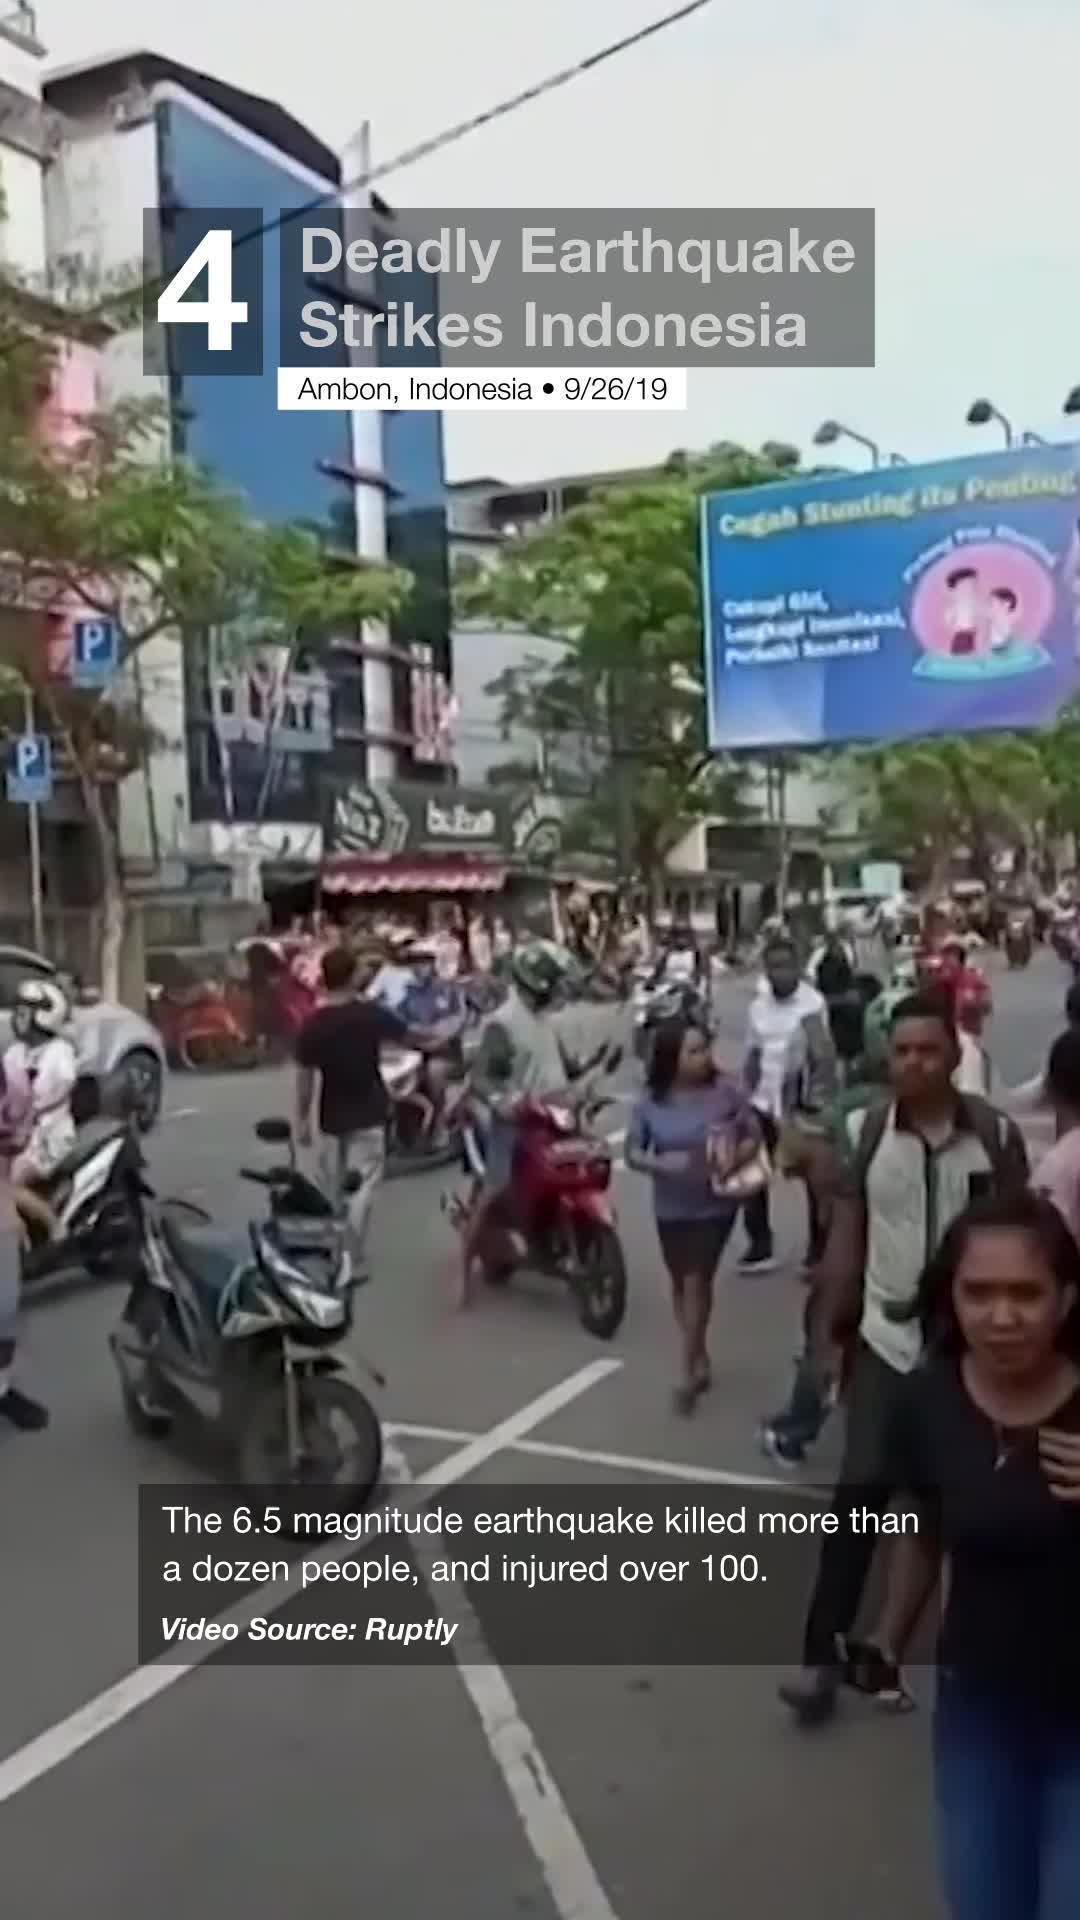 Deadly Earthquake Strikes Indonesia